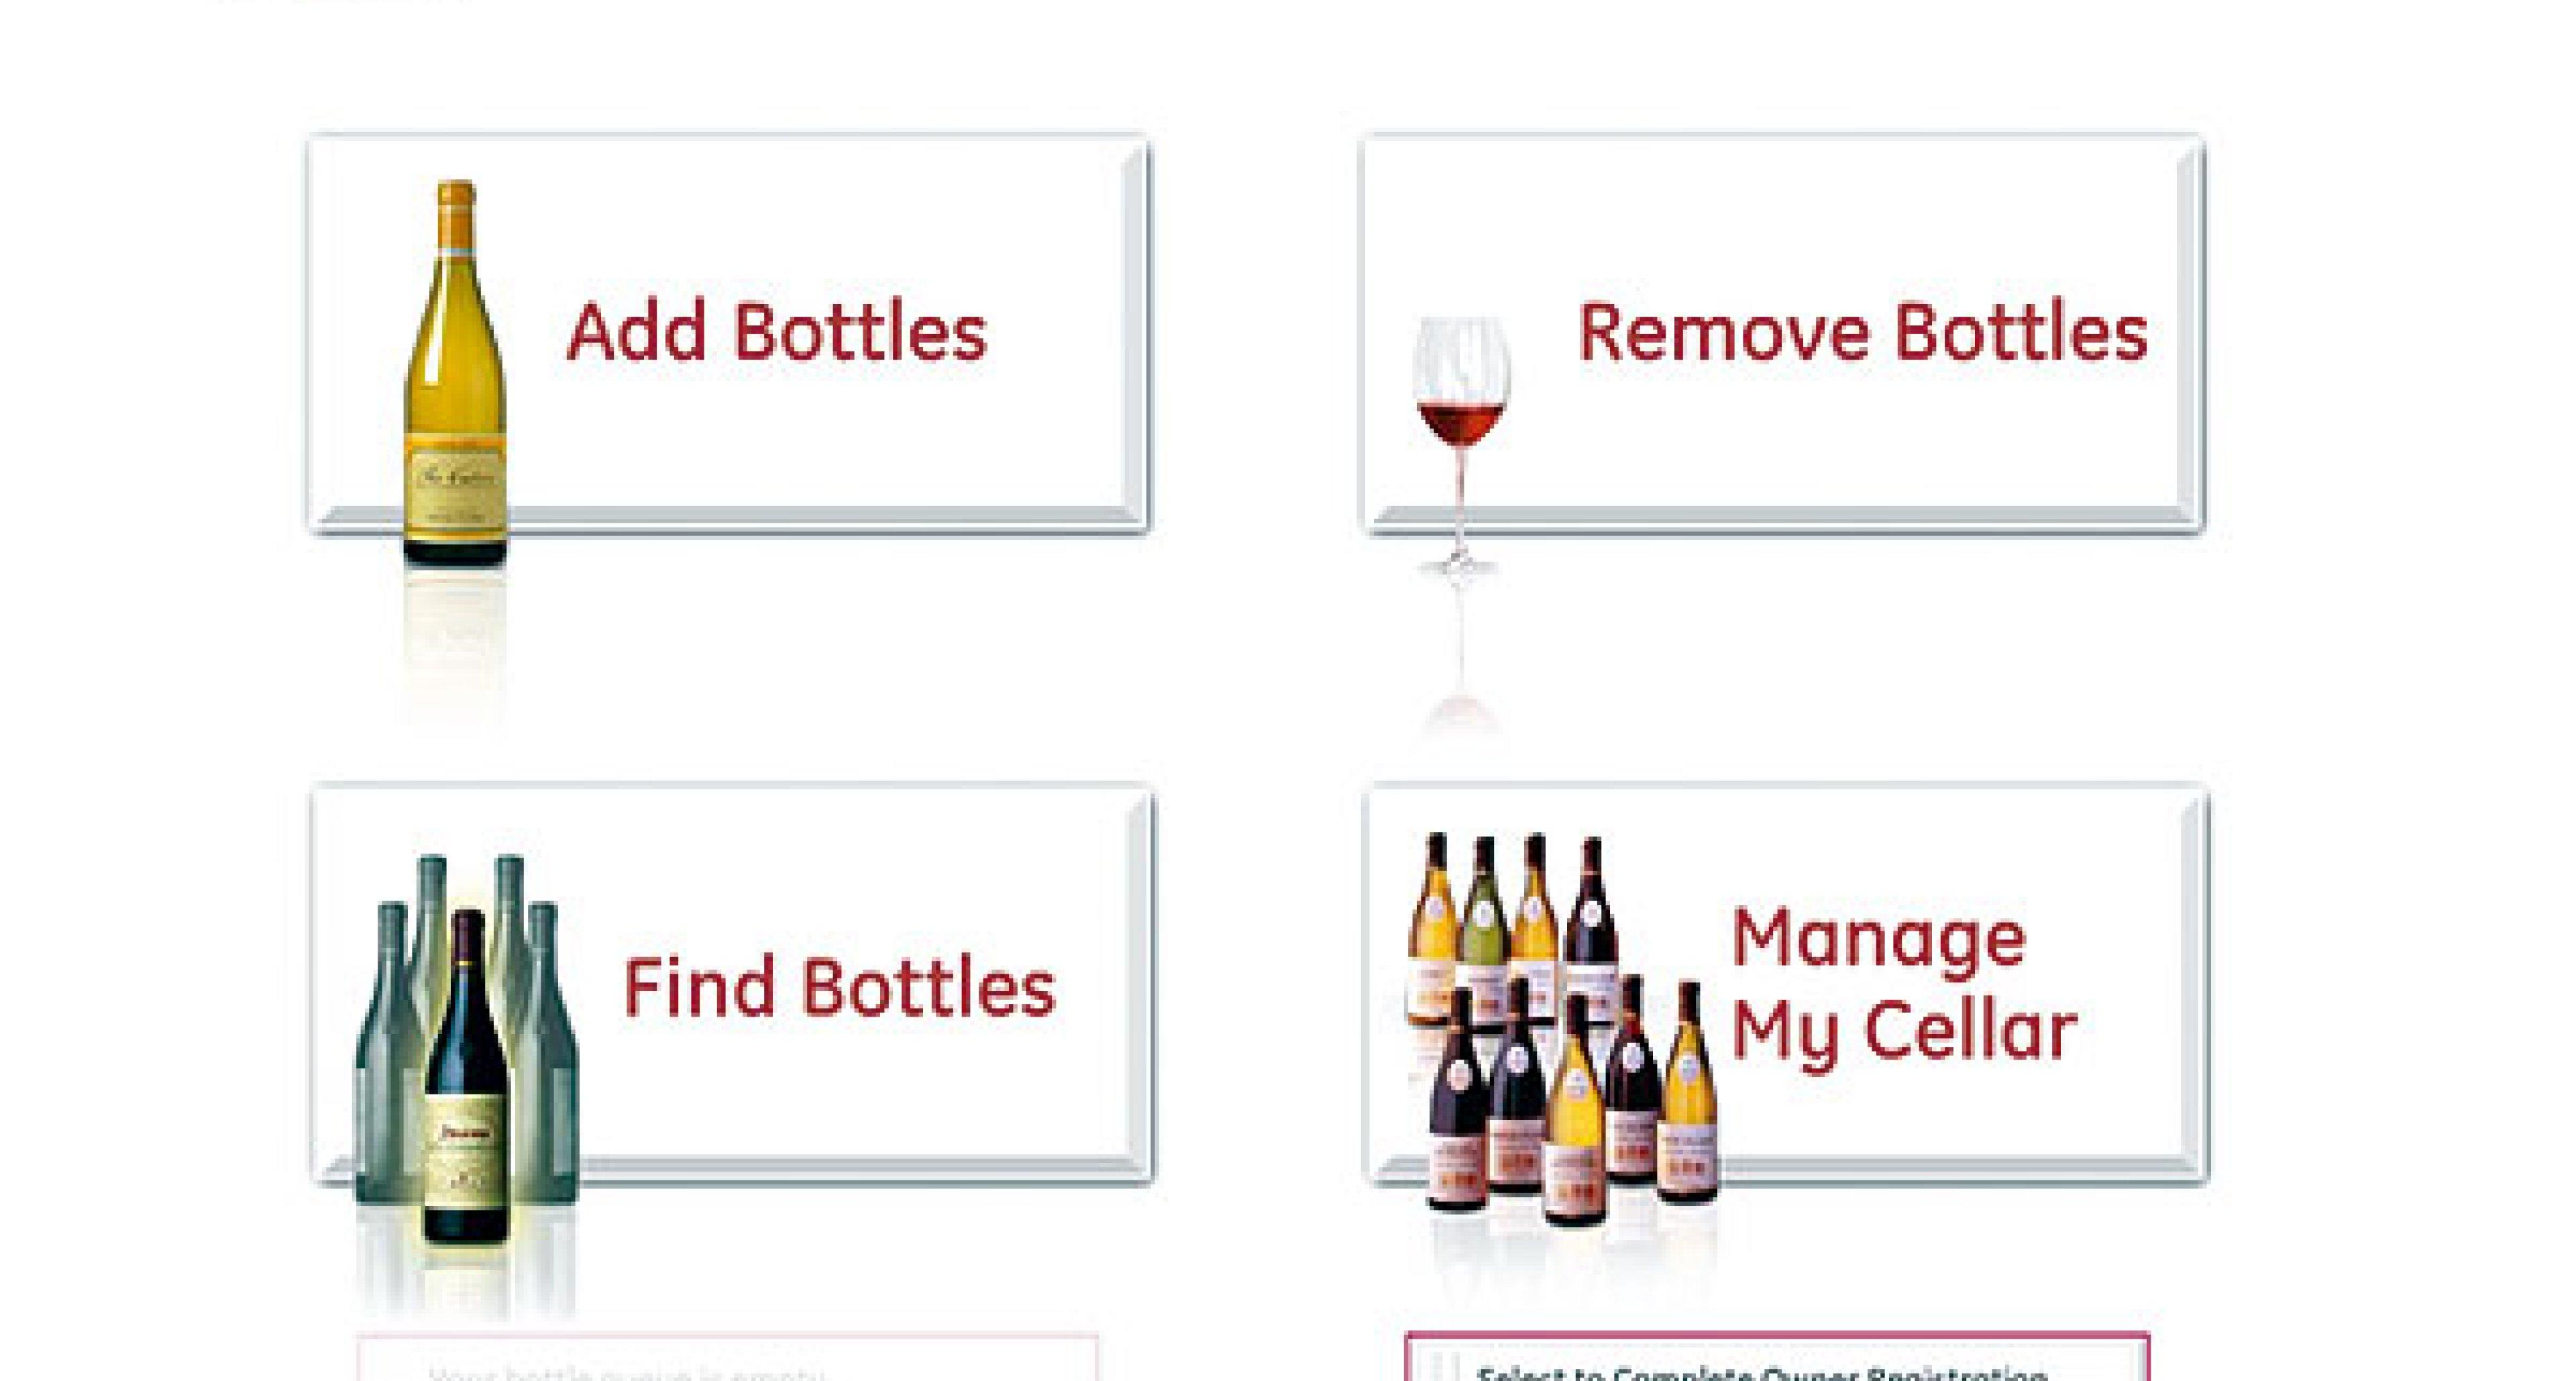 GE Monogram Wine Vault: Der Weintresor